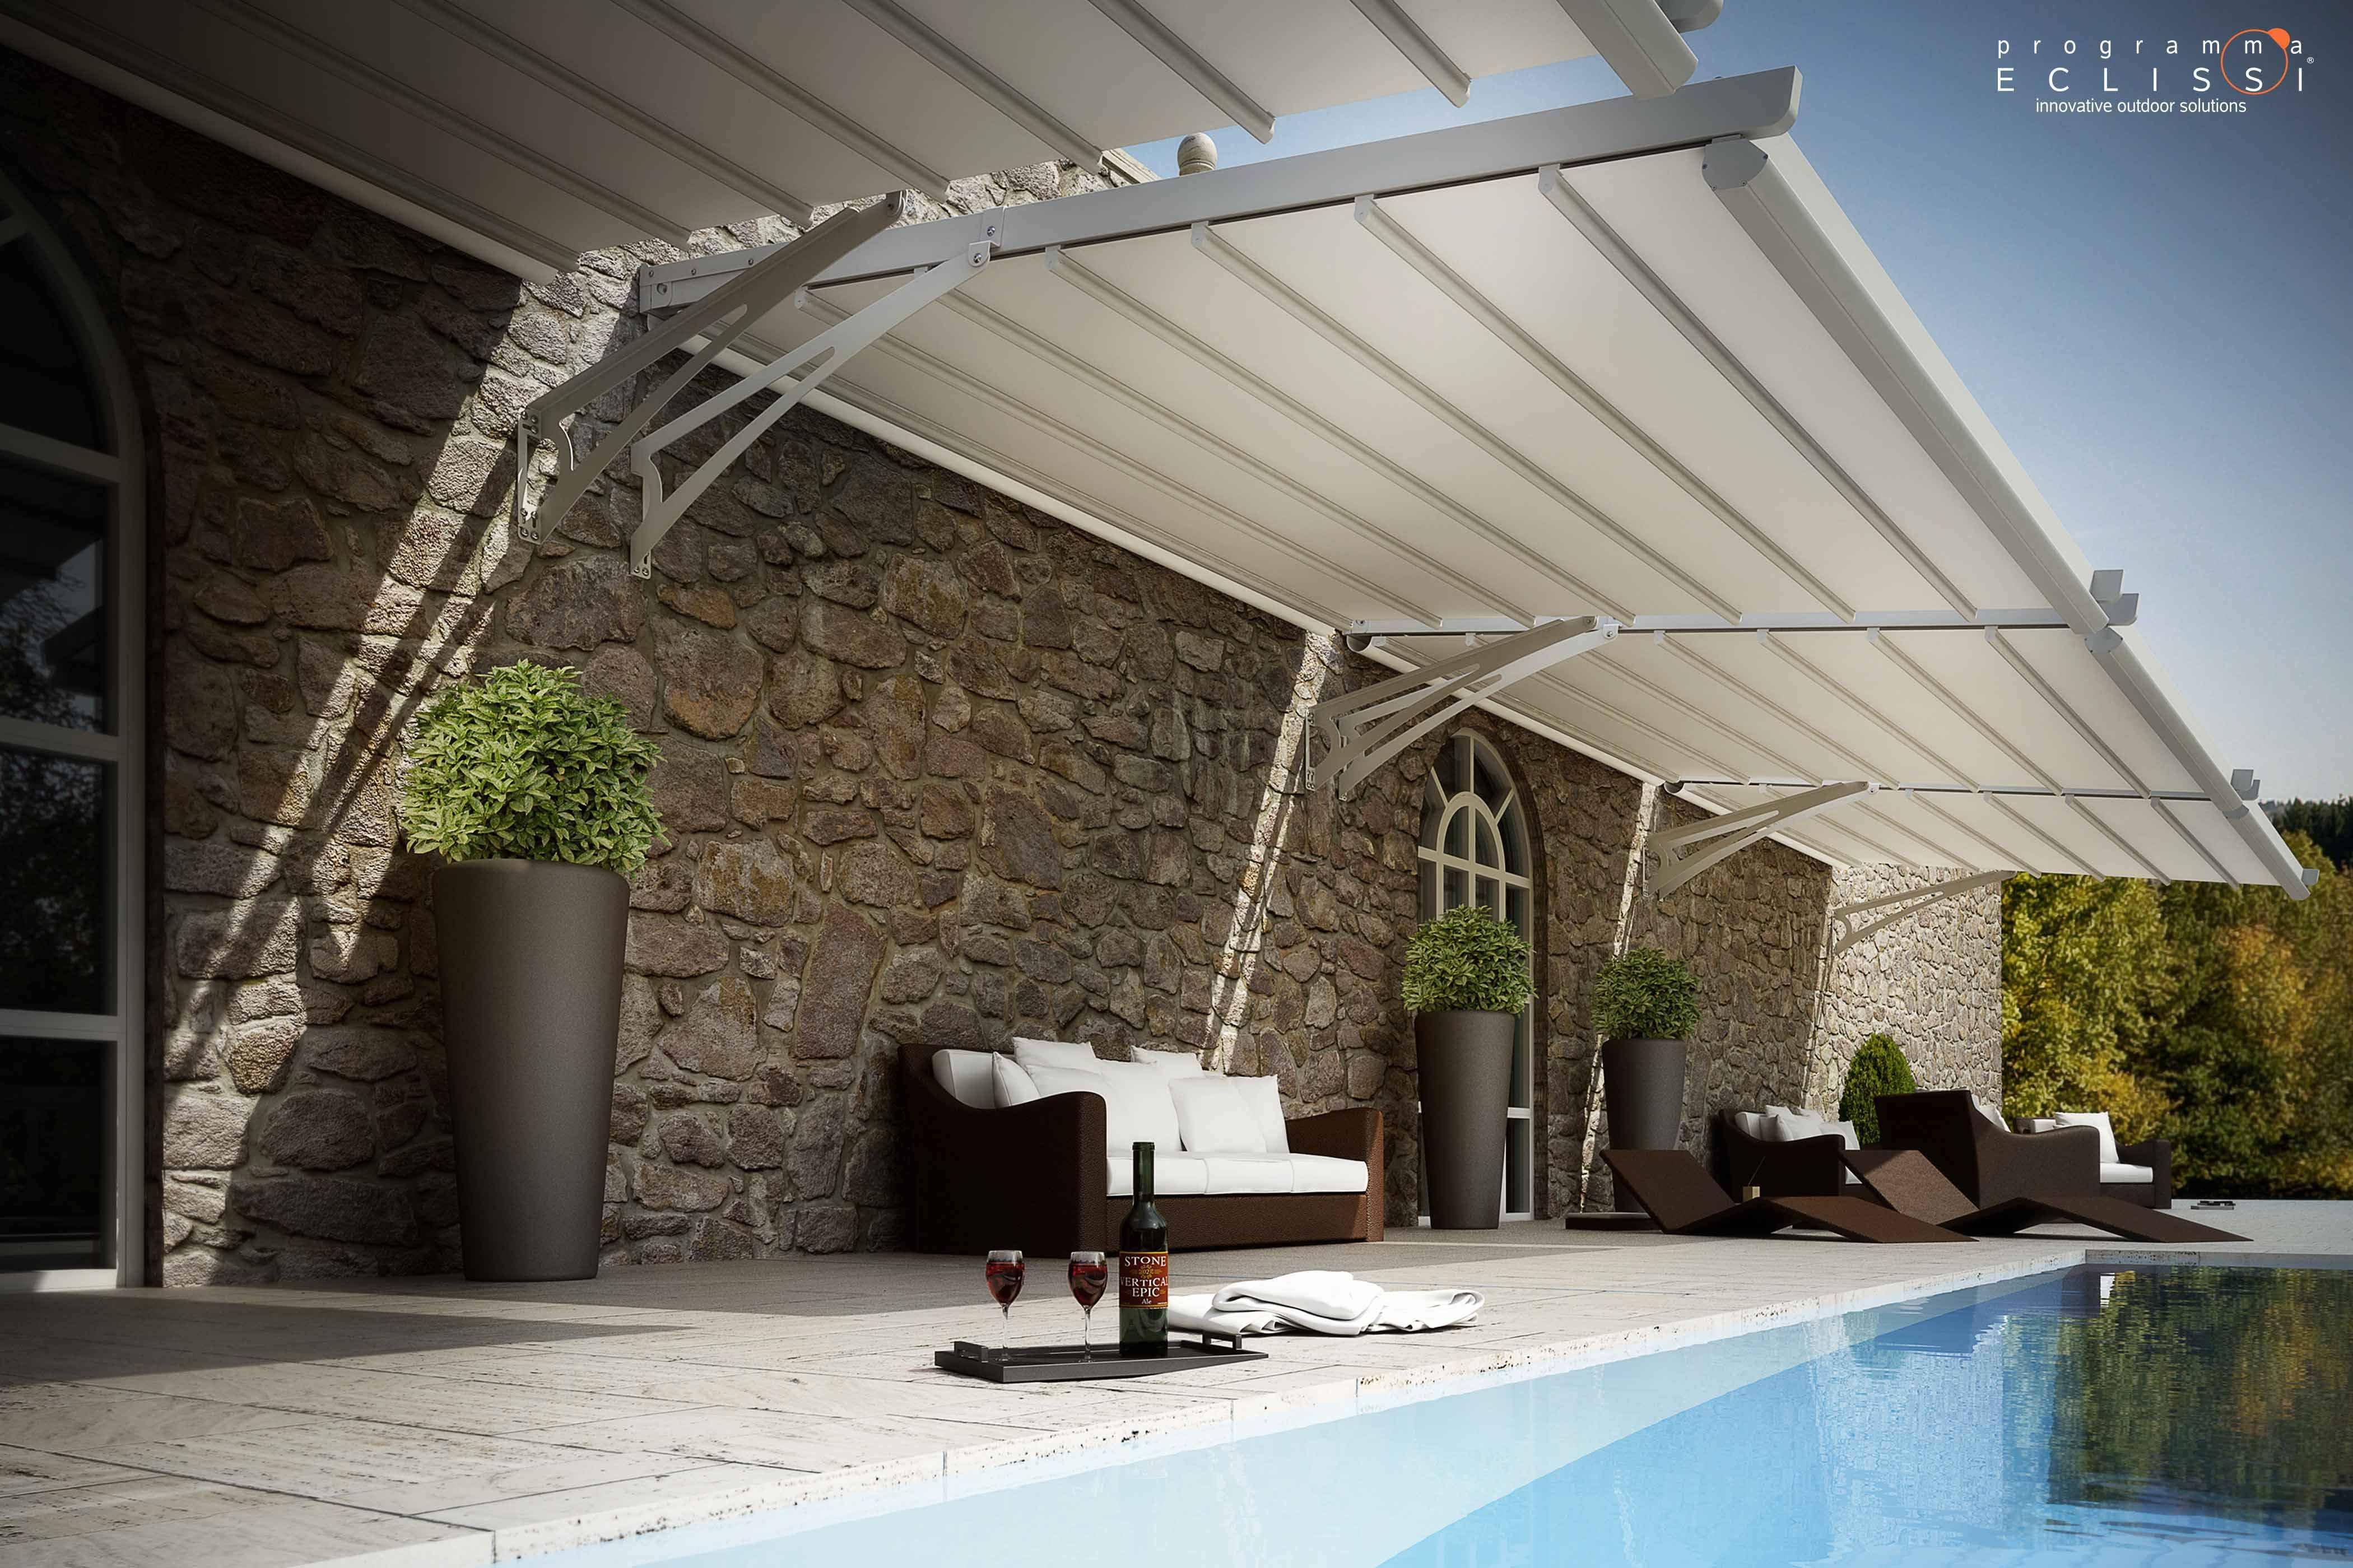 Le monde du store fermeture terrasse pergola bache - Bache pour terrasse ...